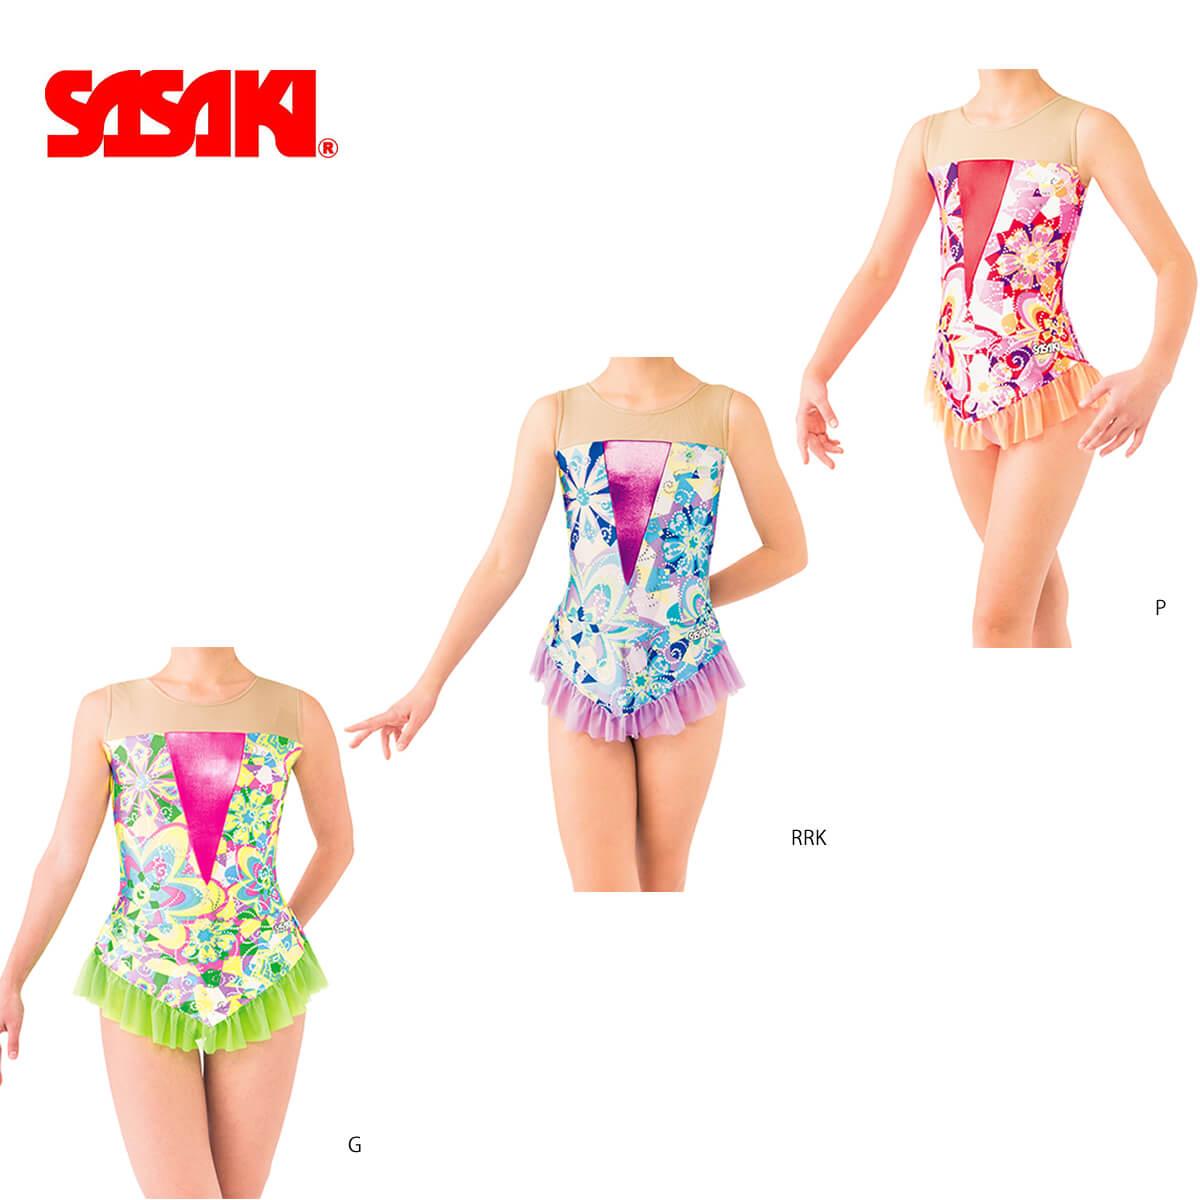 SASAKI 7368S スカート付きレオタード(大人用) 新体操 ササキ【取り寄せ】